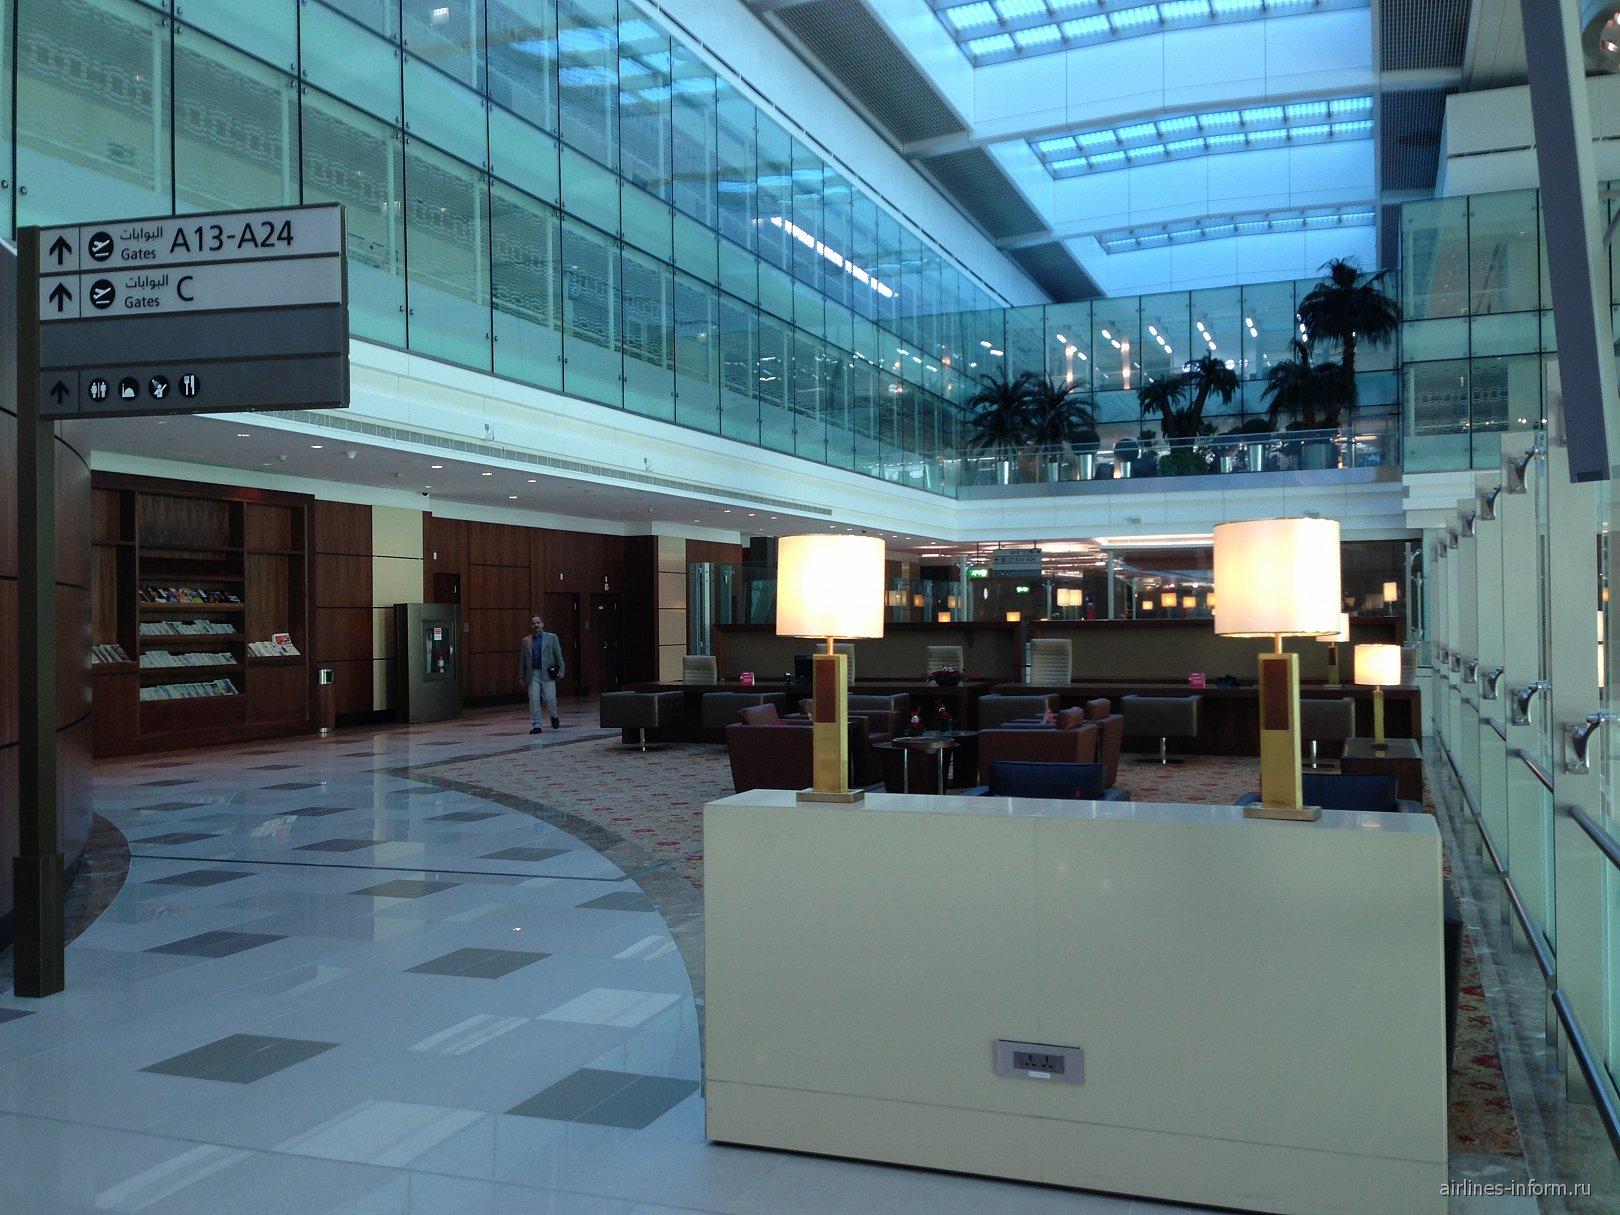 Бизнес-зал авиакомпании Emirates в аэропорту Дубай